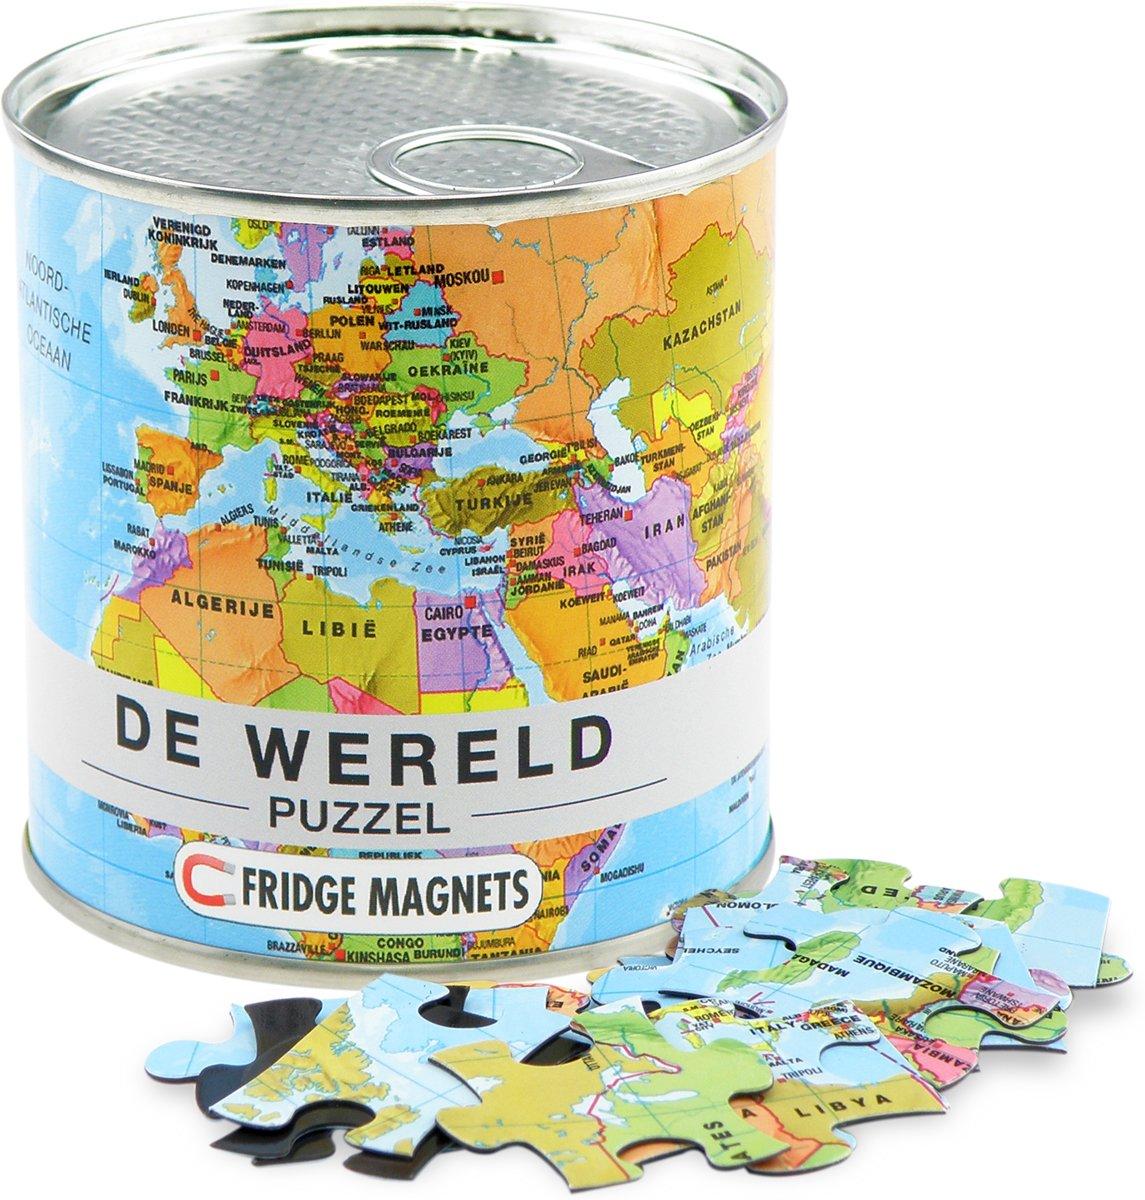 City Puzzle Wereld - Puzzel - Magnetisch - 100 puzzelstukjes